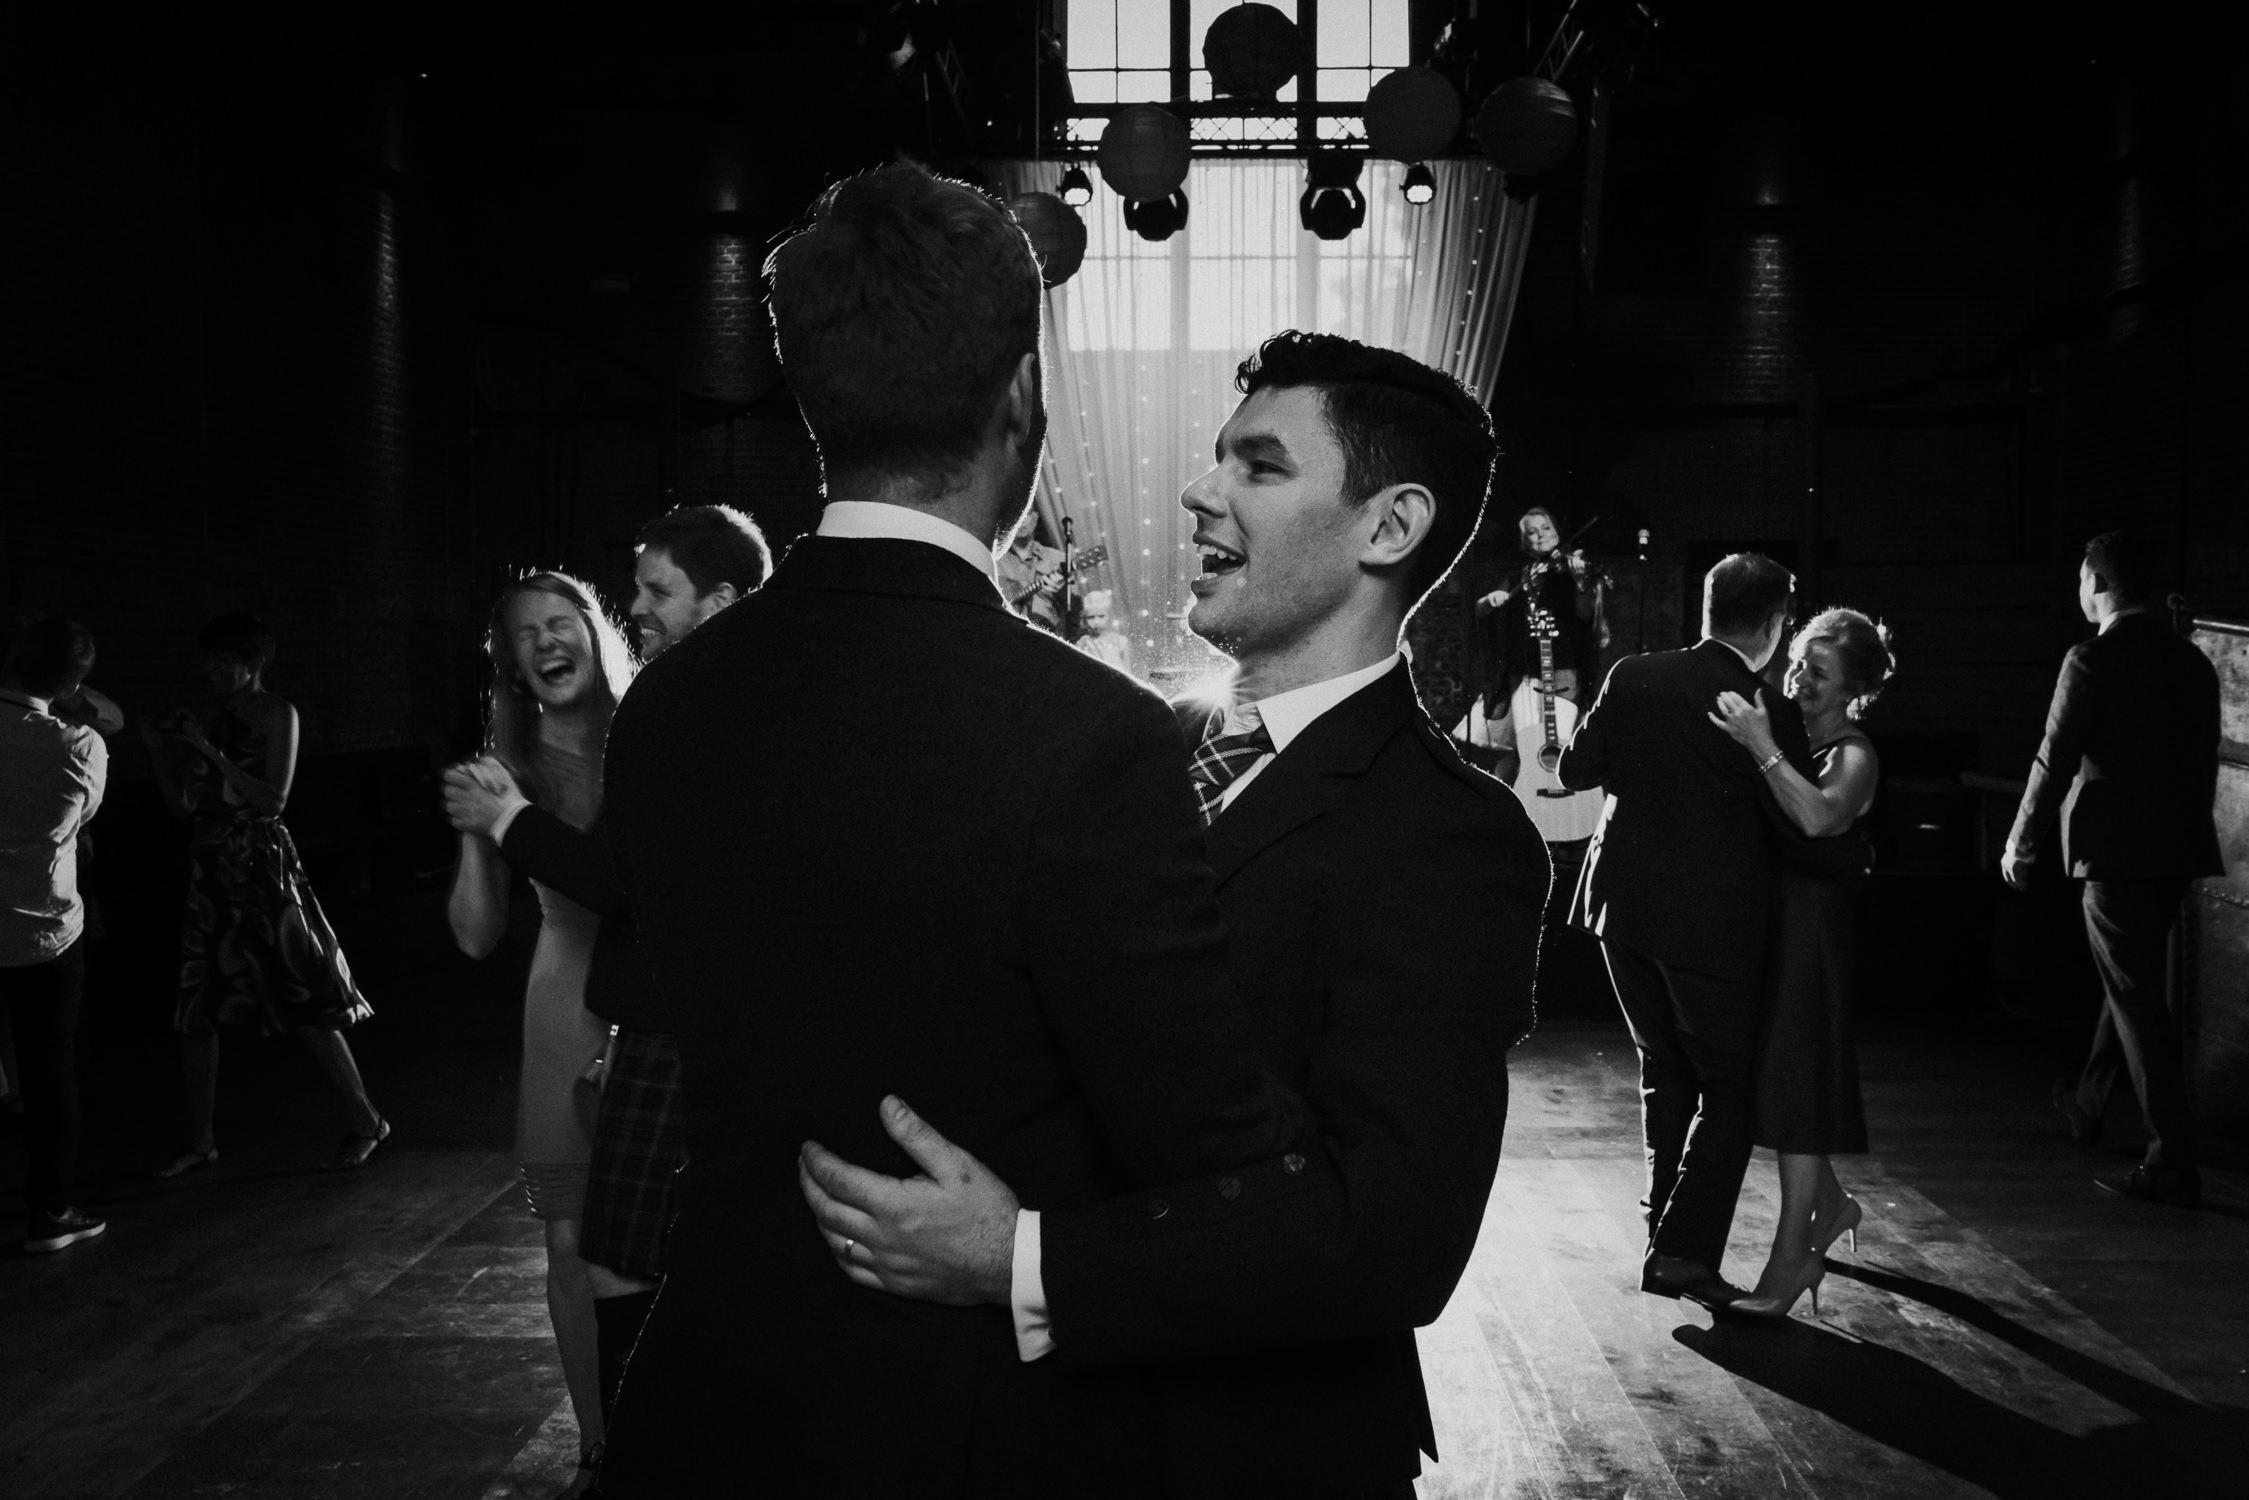 amsterdam-wedding-photographer-trouwfotograaf-bruidsfotograaf-mark-hadden-bruidsfotografie-David & Ronald-335-2.jpg